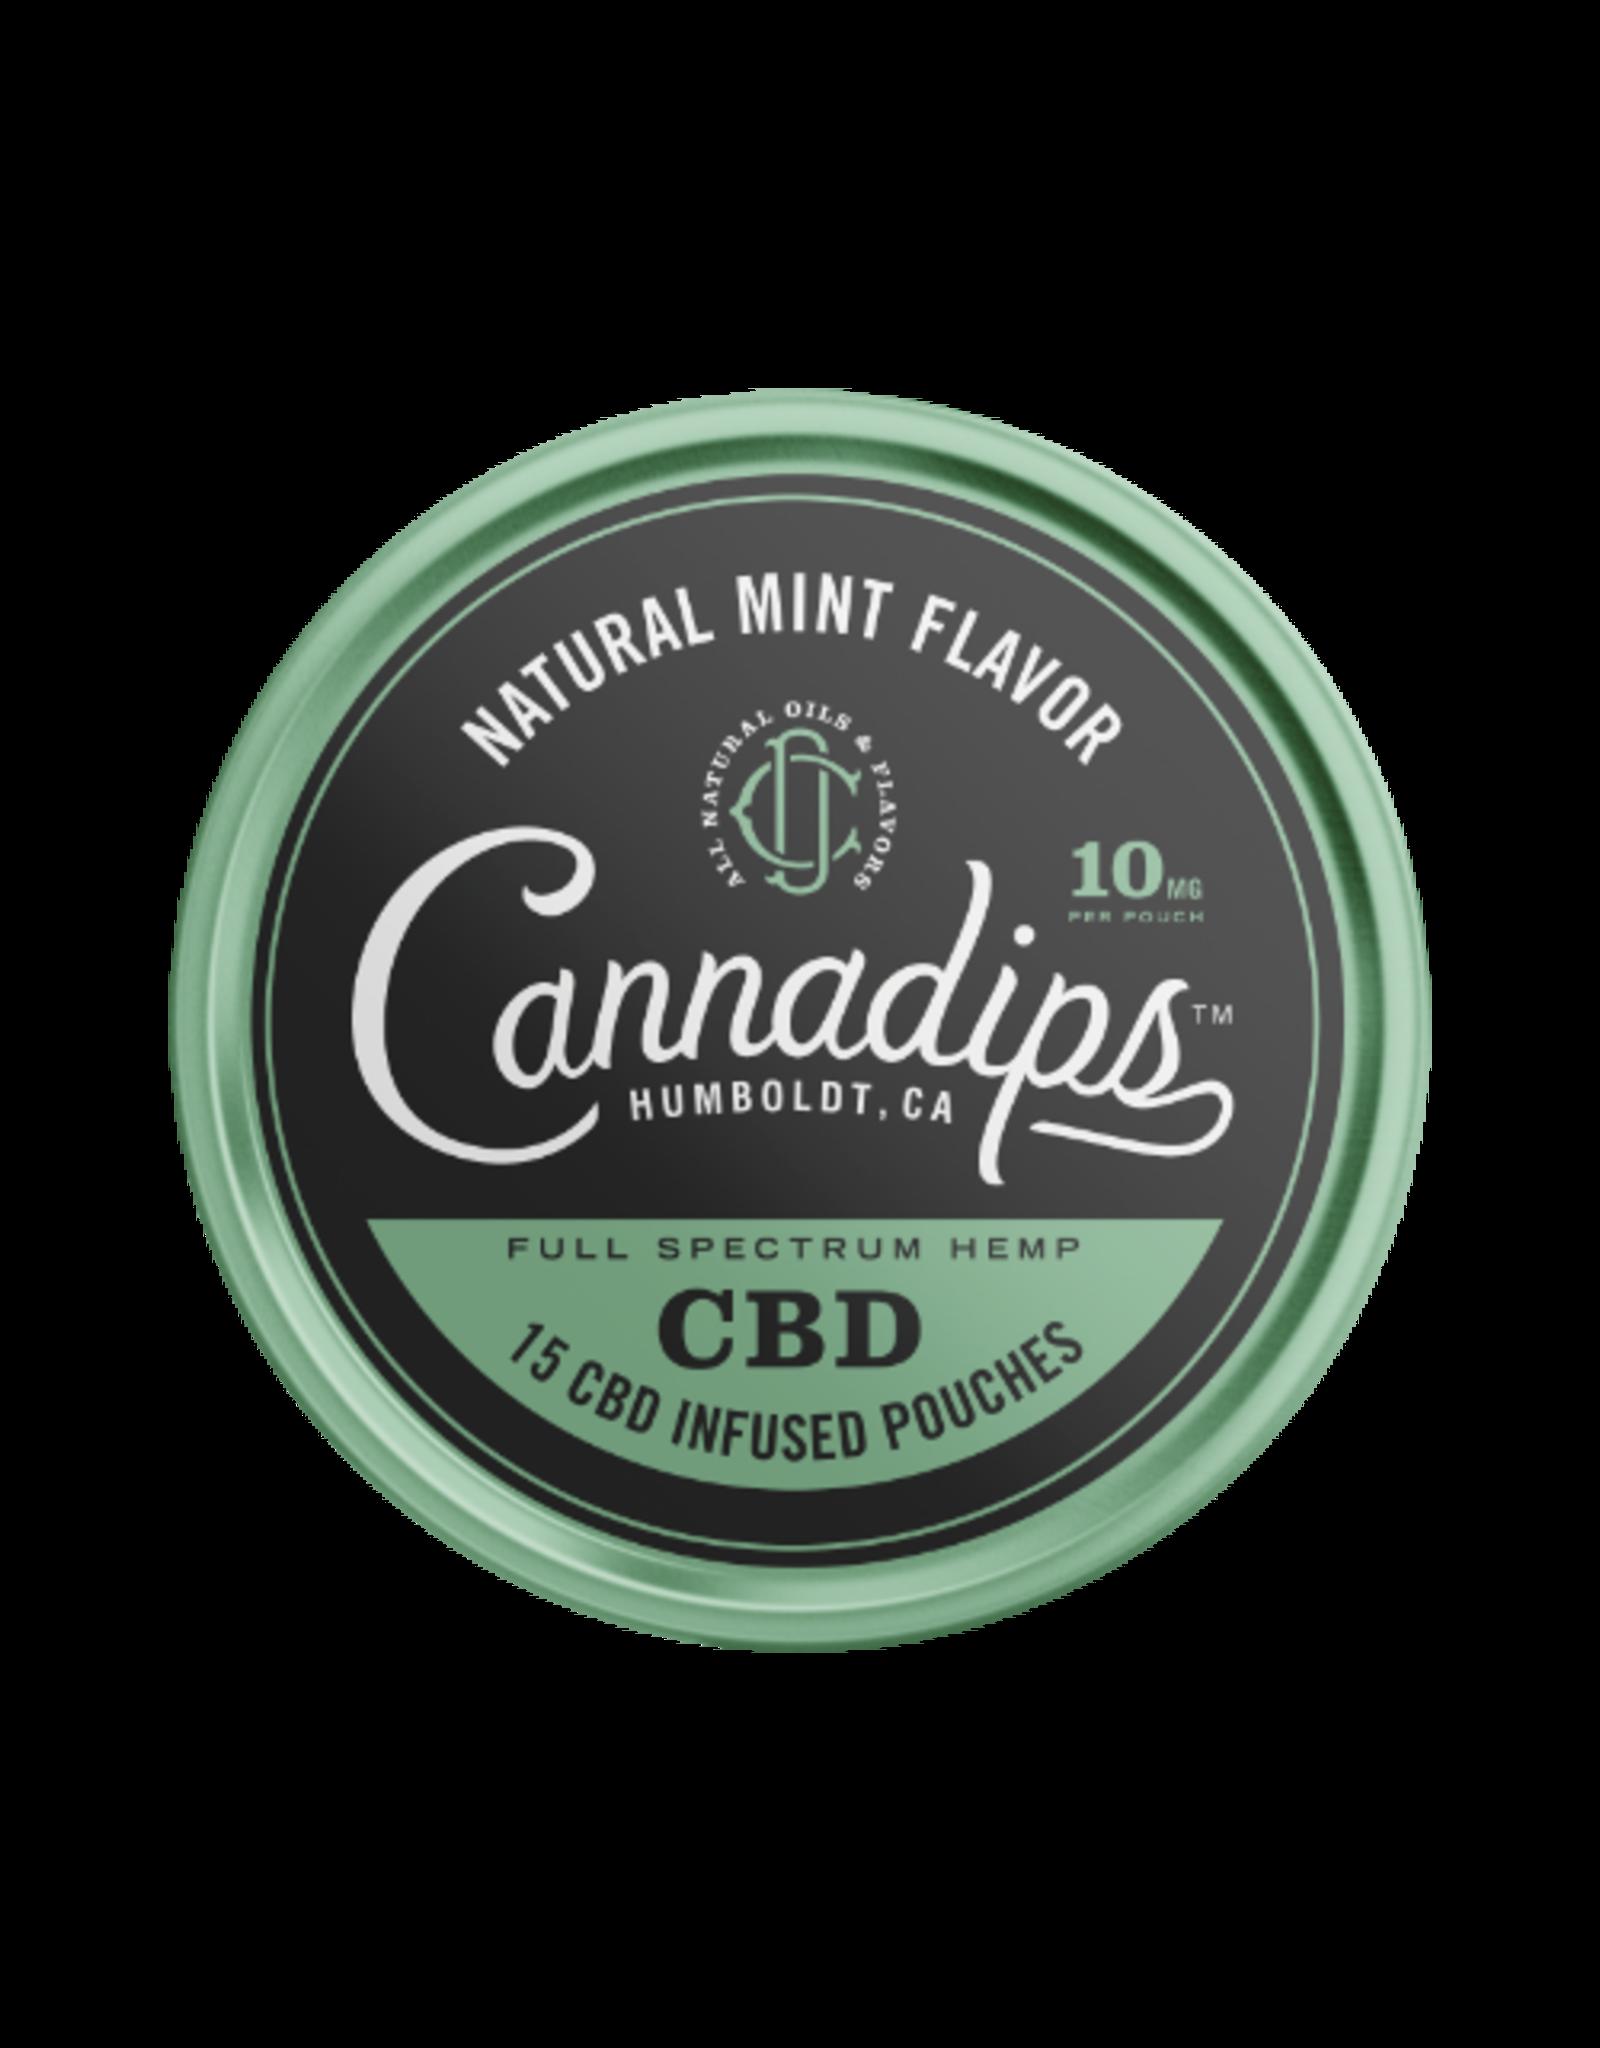 Cannadips Cannadips Natural Mint Flavour CBD 8,25g Dose